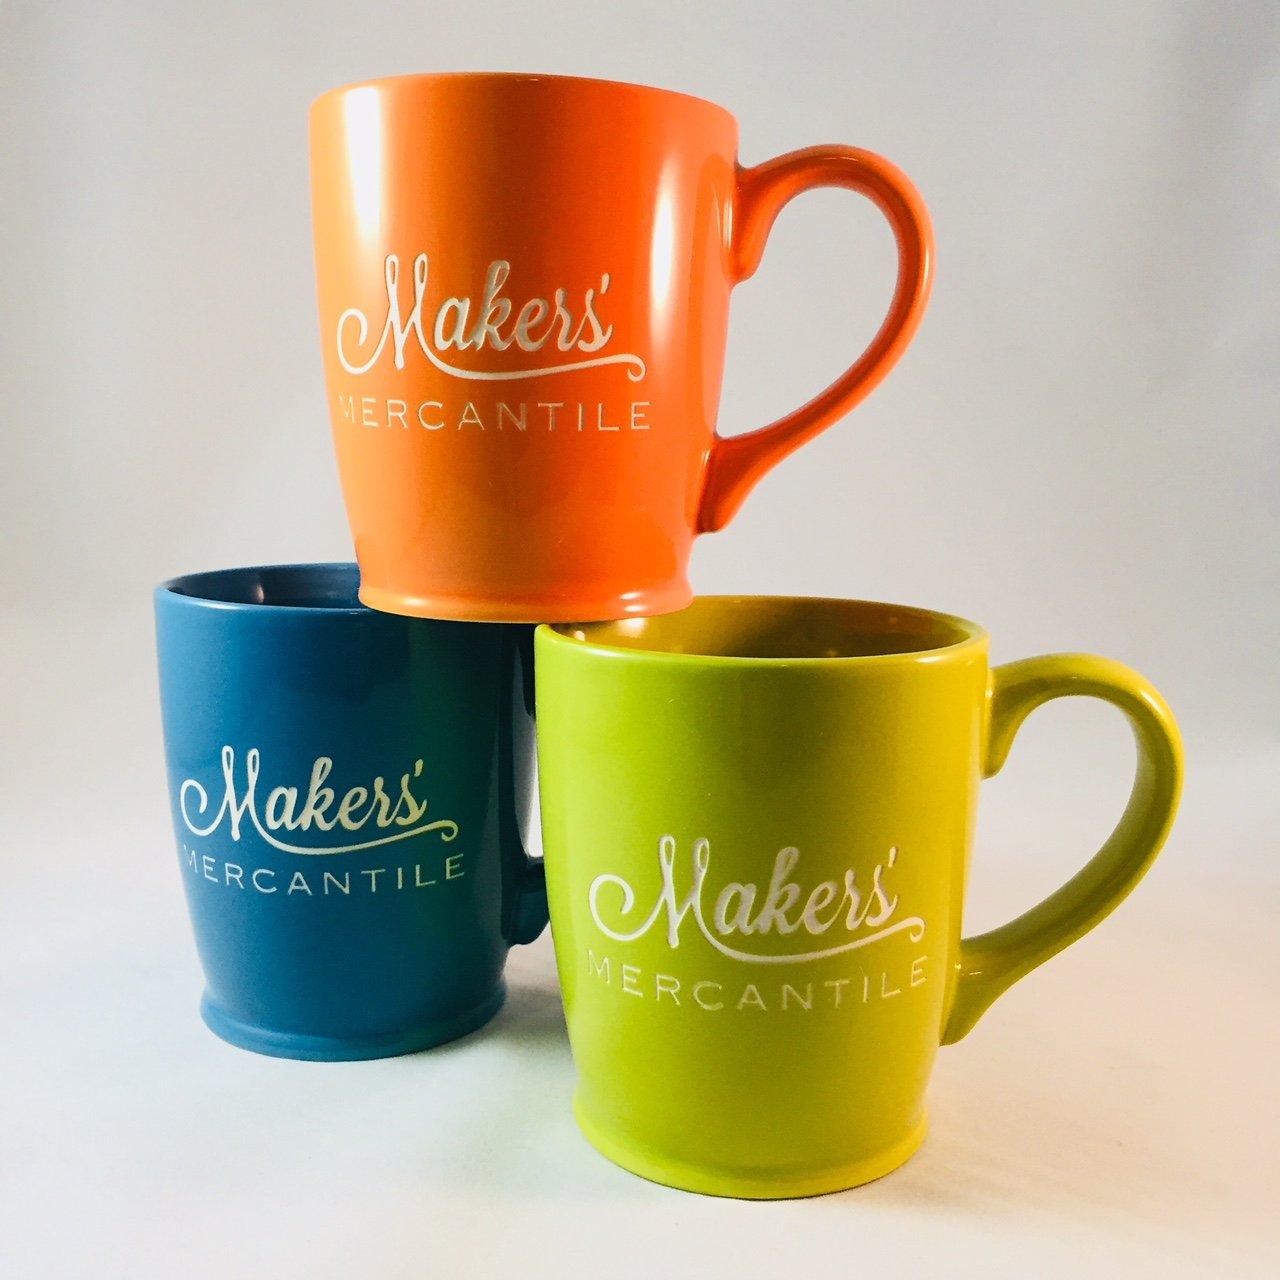 Makers Mercantile Mug